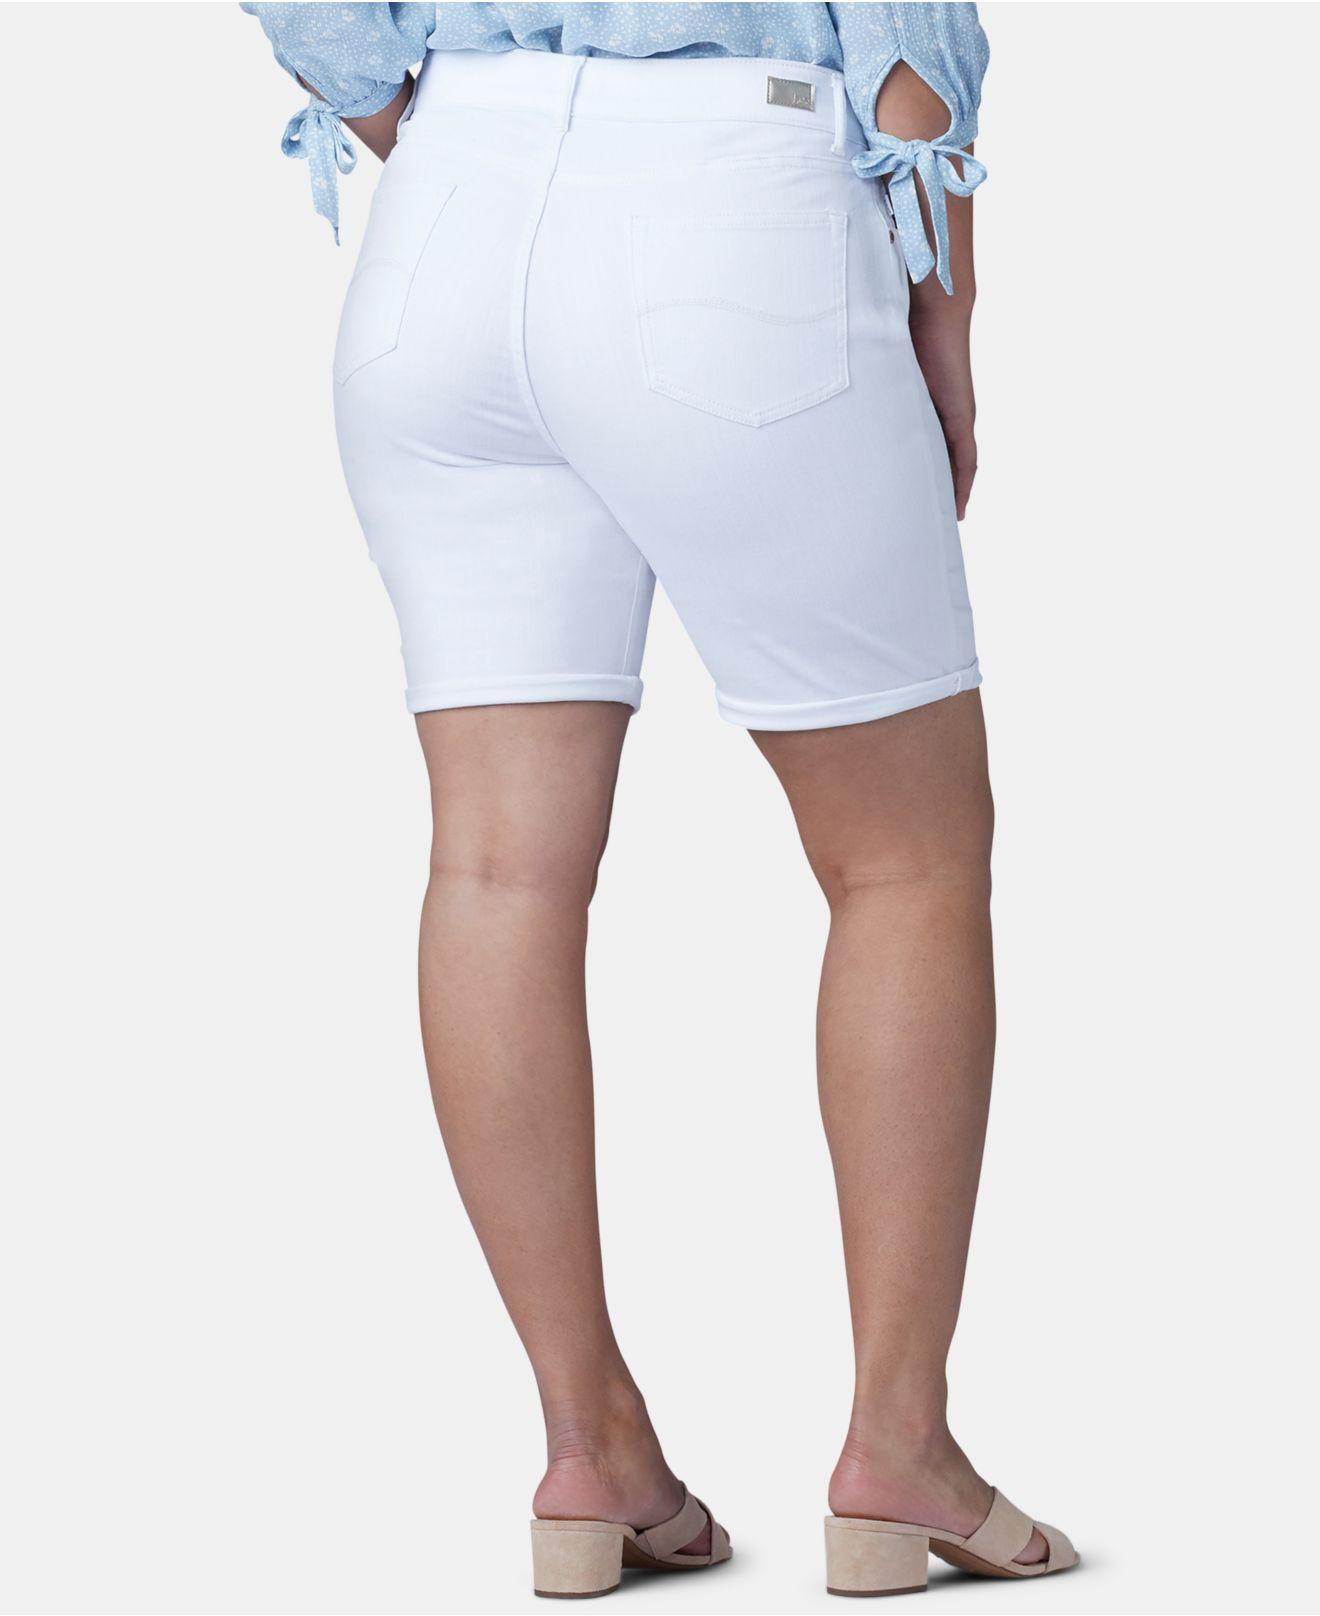 b7cb64026de Lyst - Lee Platinum Plus Size Flex To Go Bermuda Shorts in White